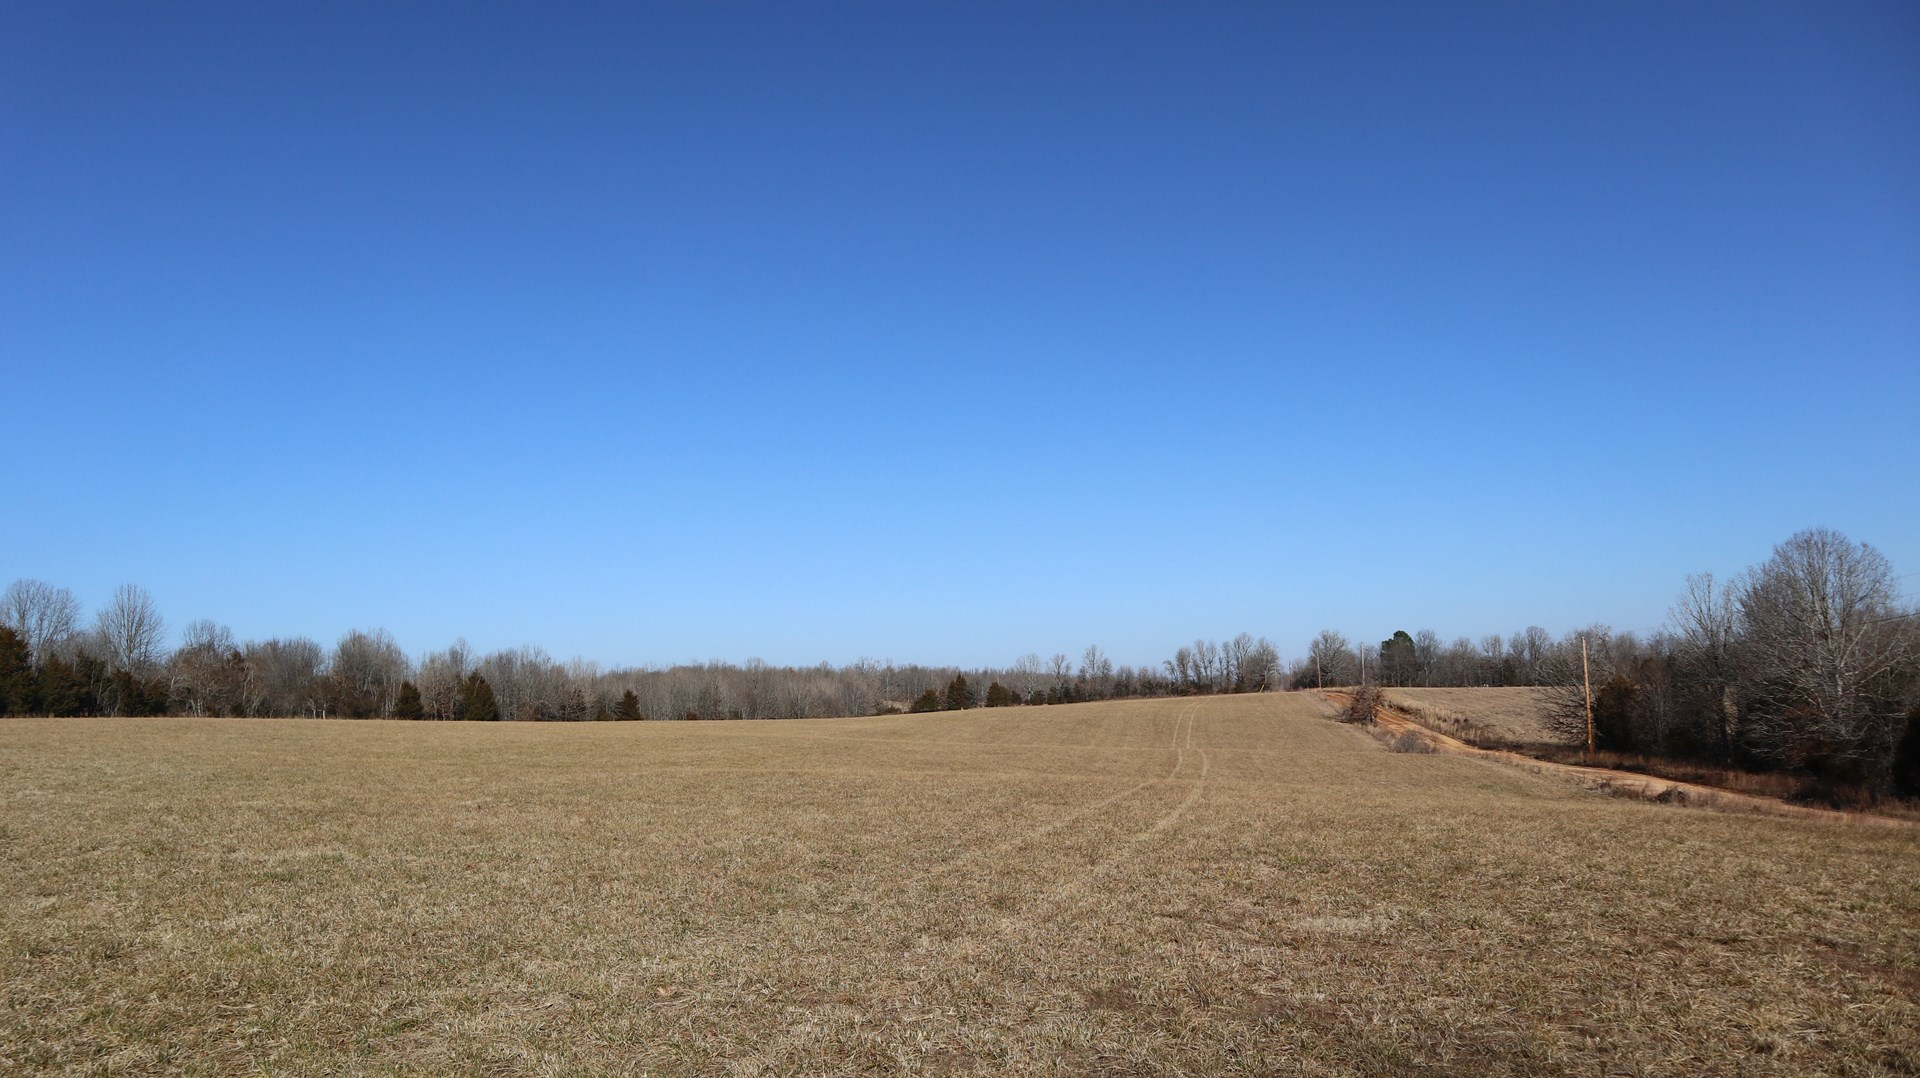 Ozarks Farm and Recreation Property for sale near Salem, AR